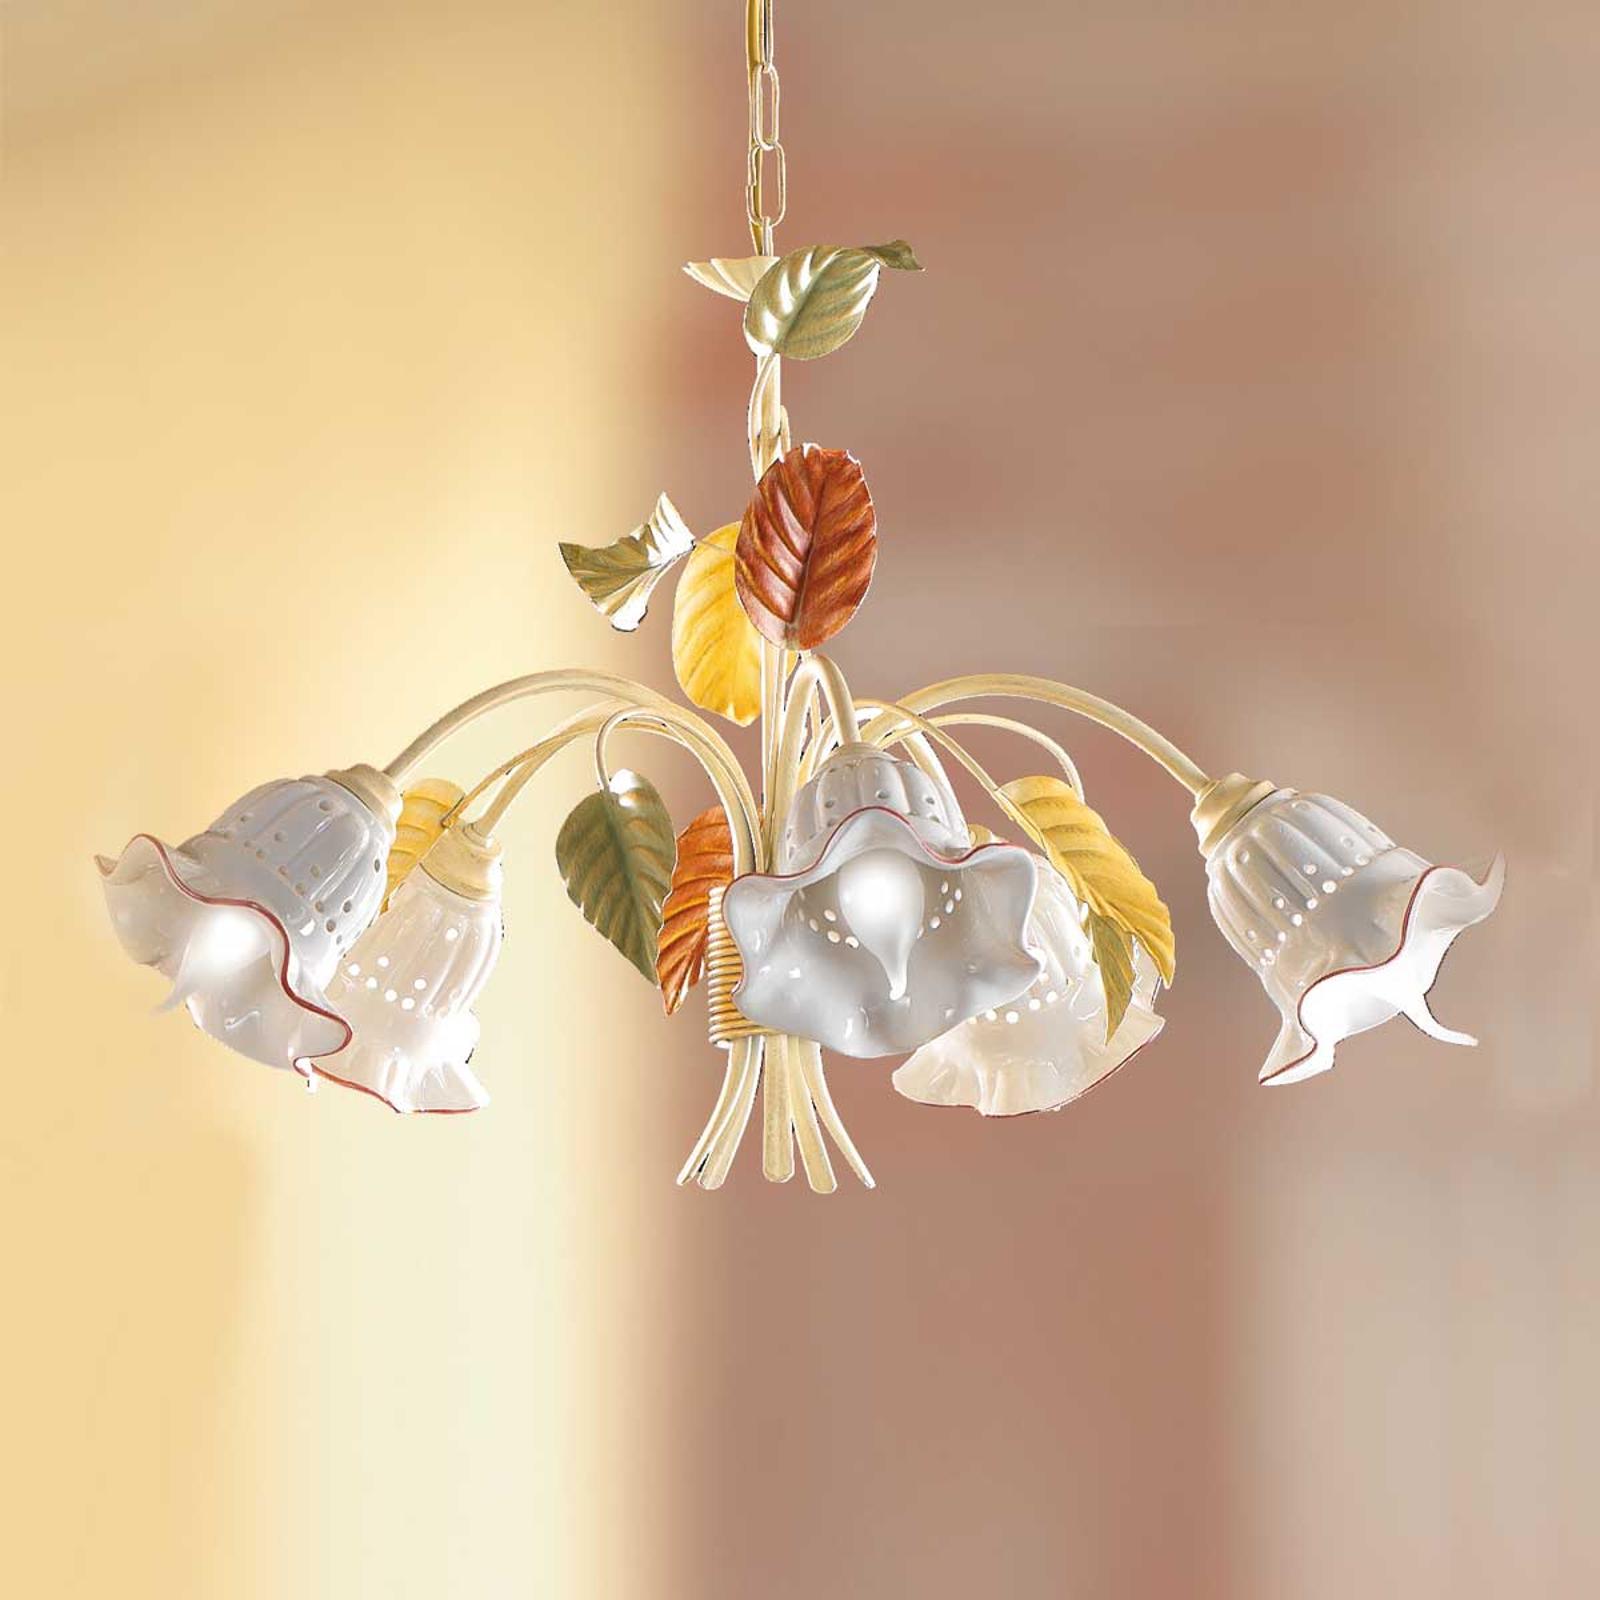 Lampa wisząca Flora 5 punktowa